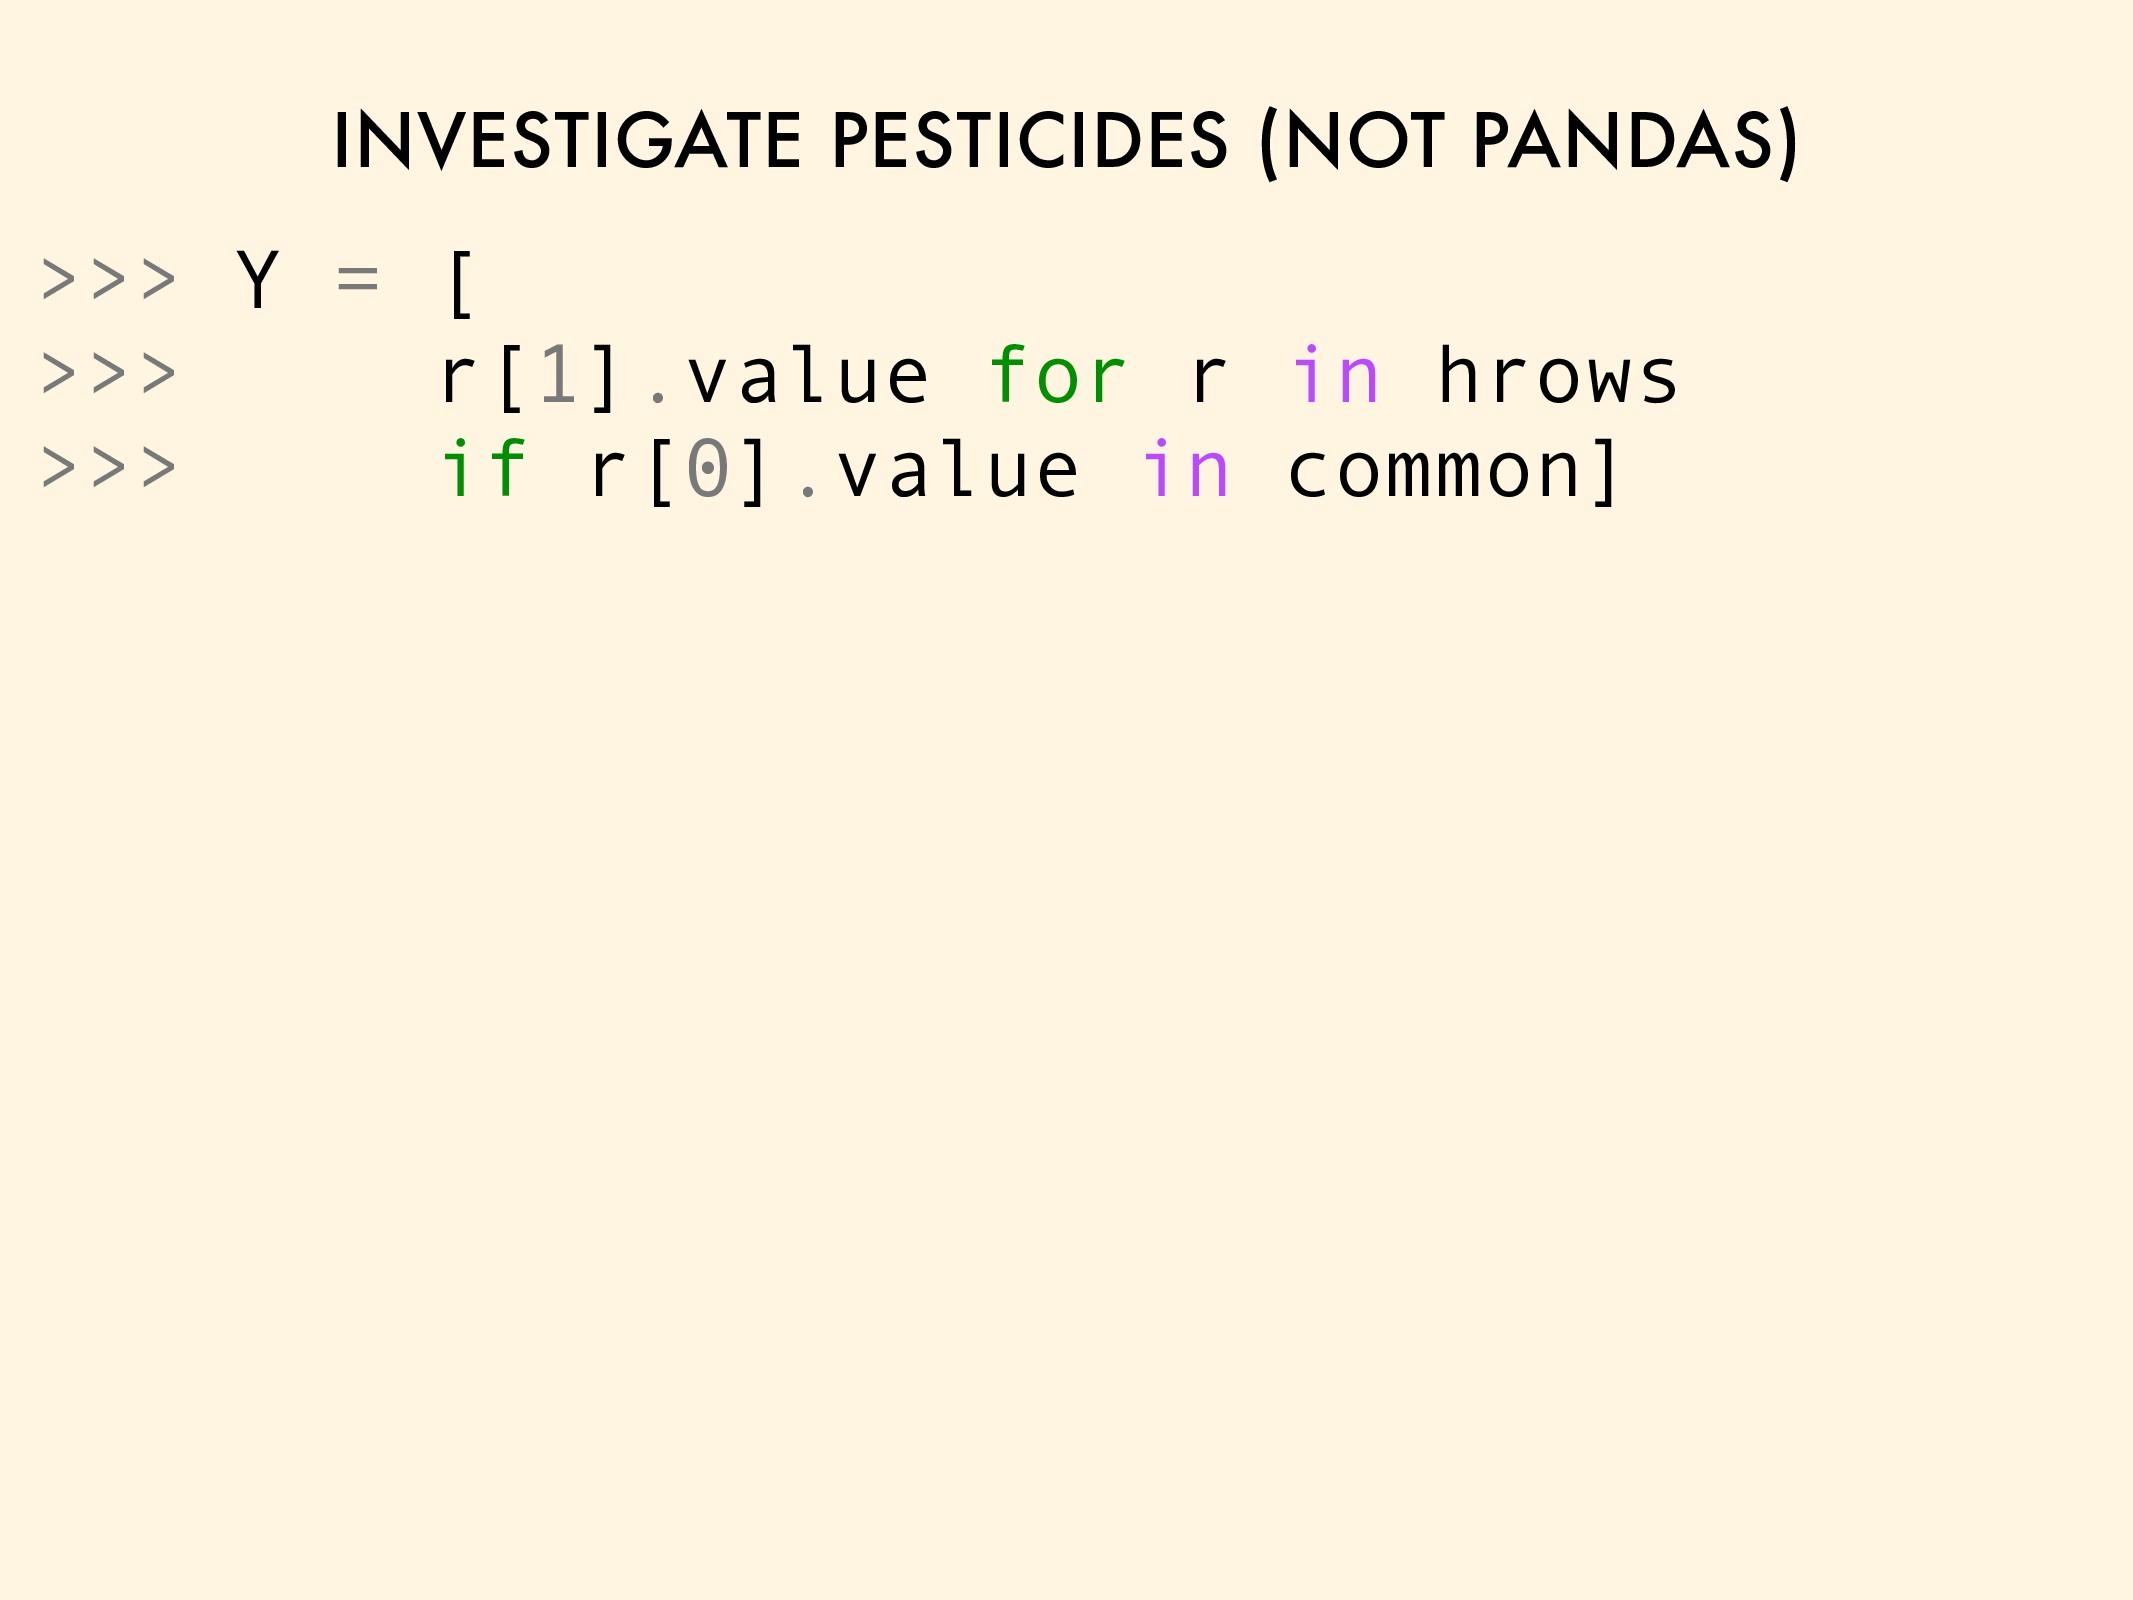 INVESTIGATE PESTICIDES (NOT PANDAS) >>> Y = [ >...